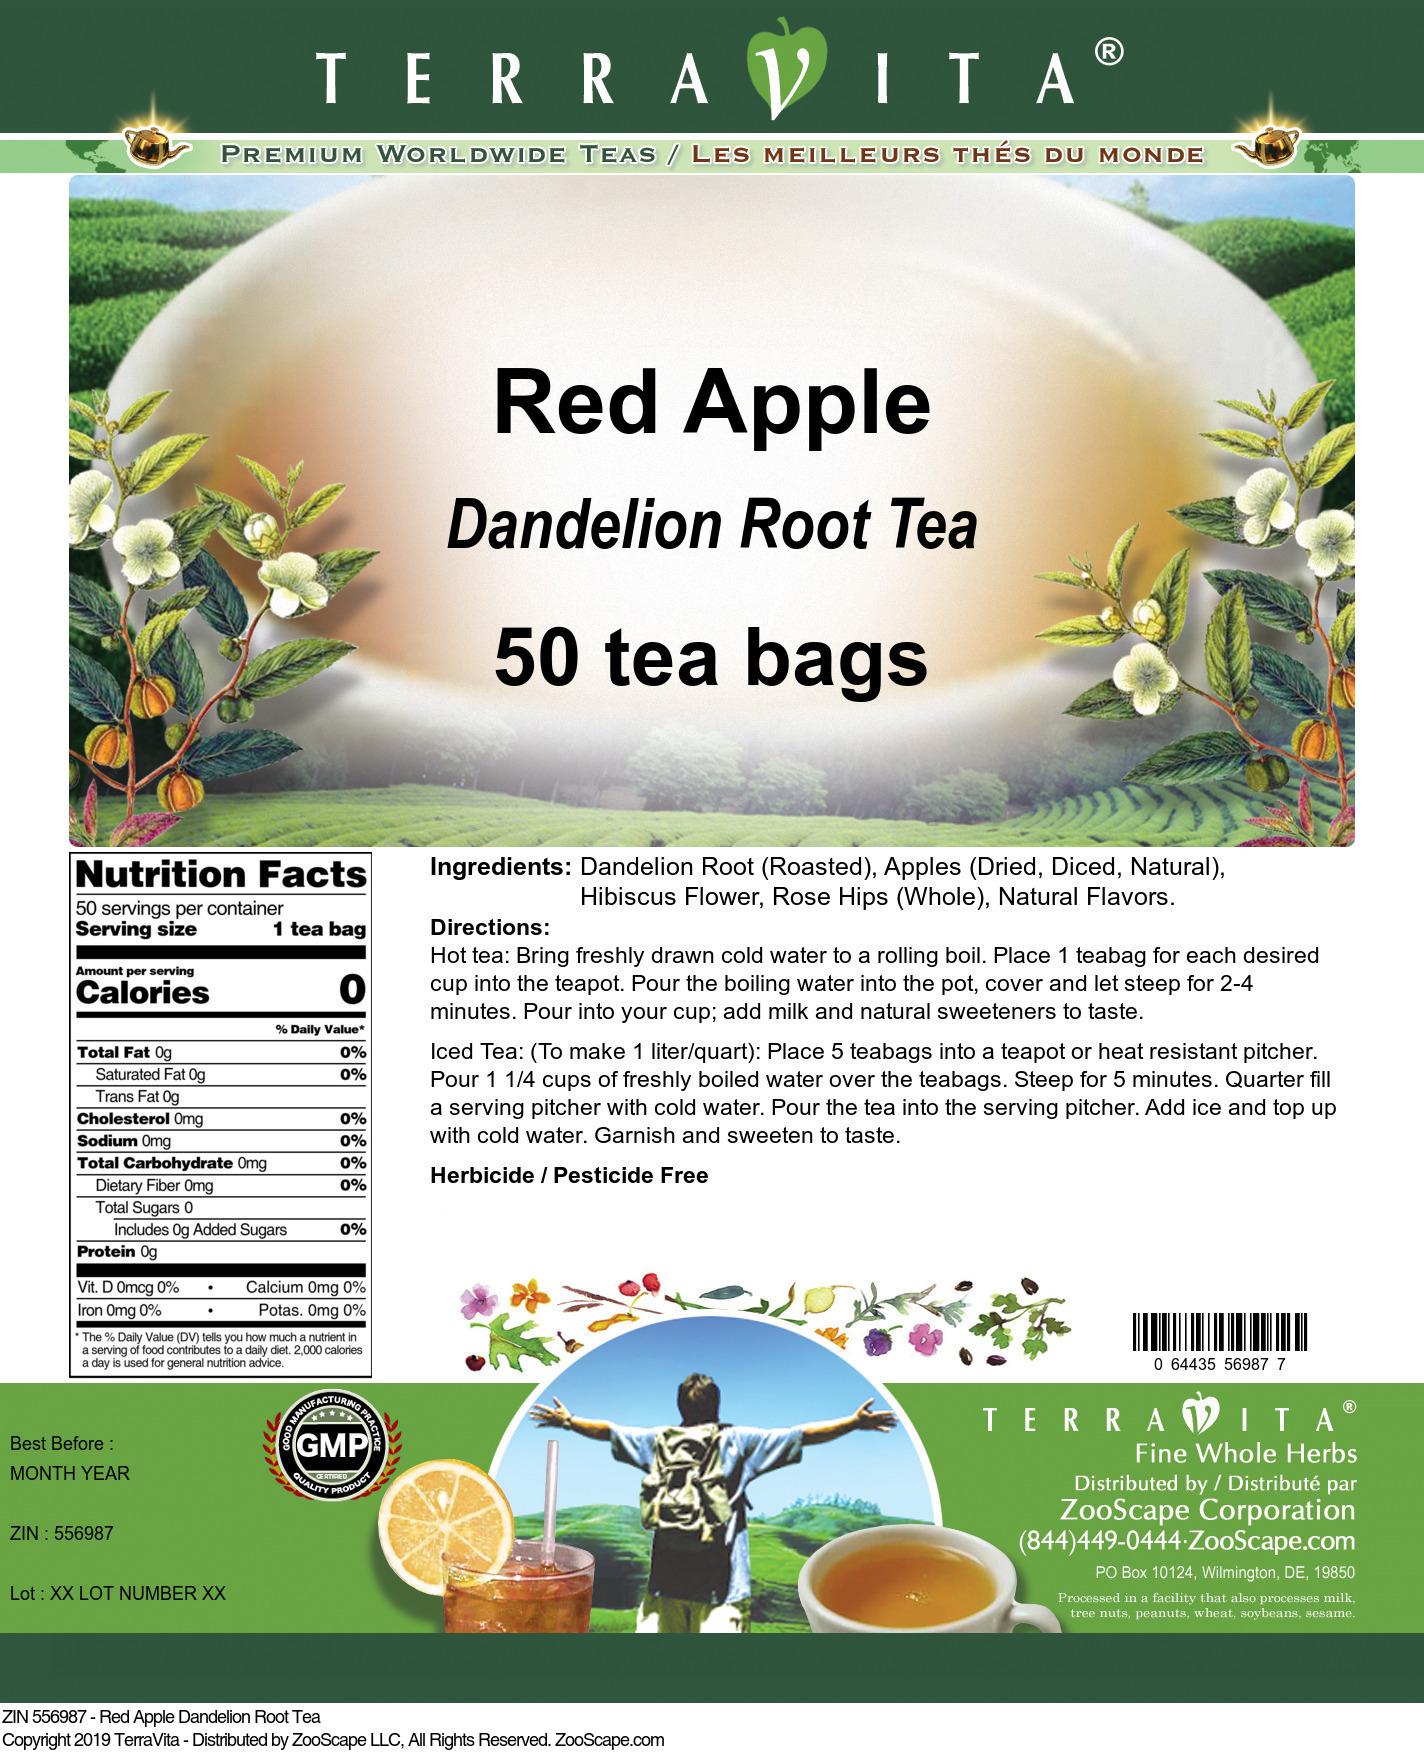 Red Apple Dandelion Root